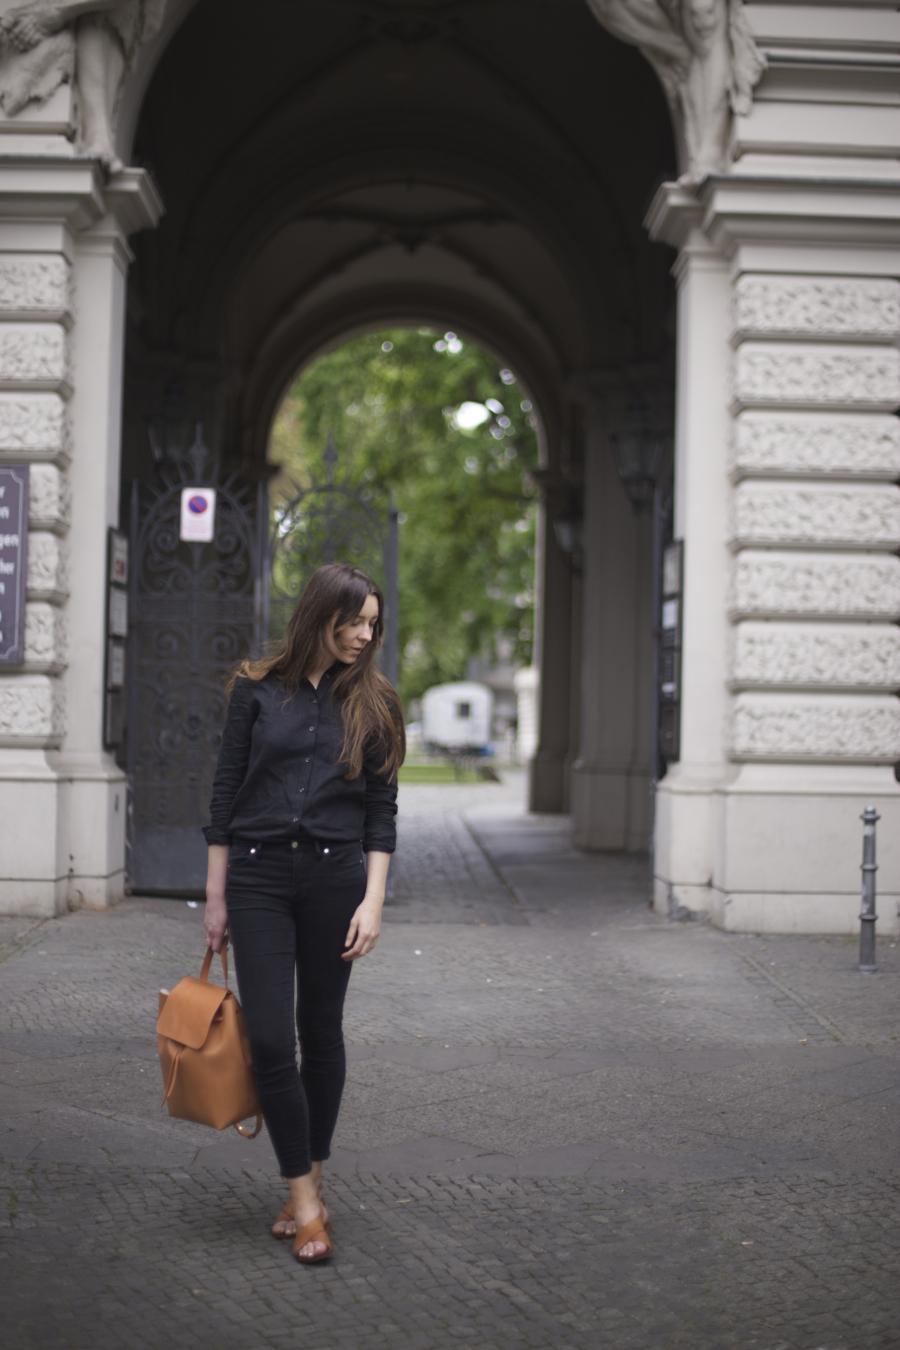 ari_traegt_toteme_linen_shirt_mansur_gavriel_backpack7